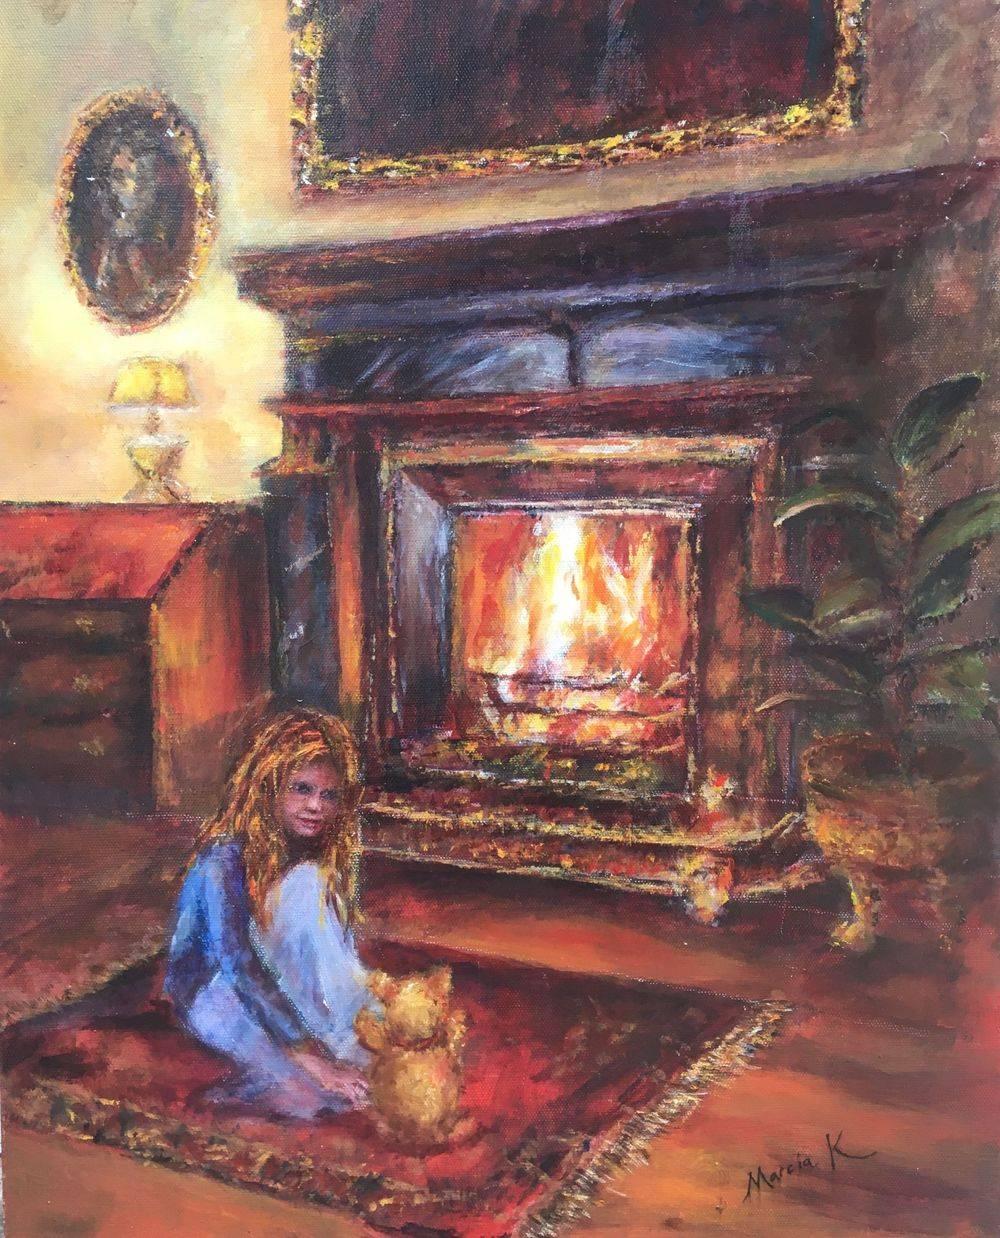 Bonfire Night. Mixed media painting by Marcia Kuperberg